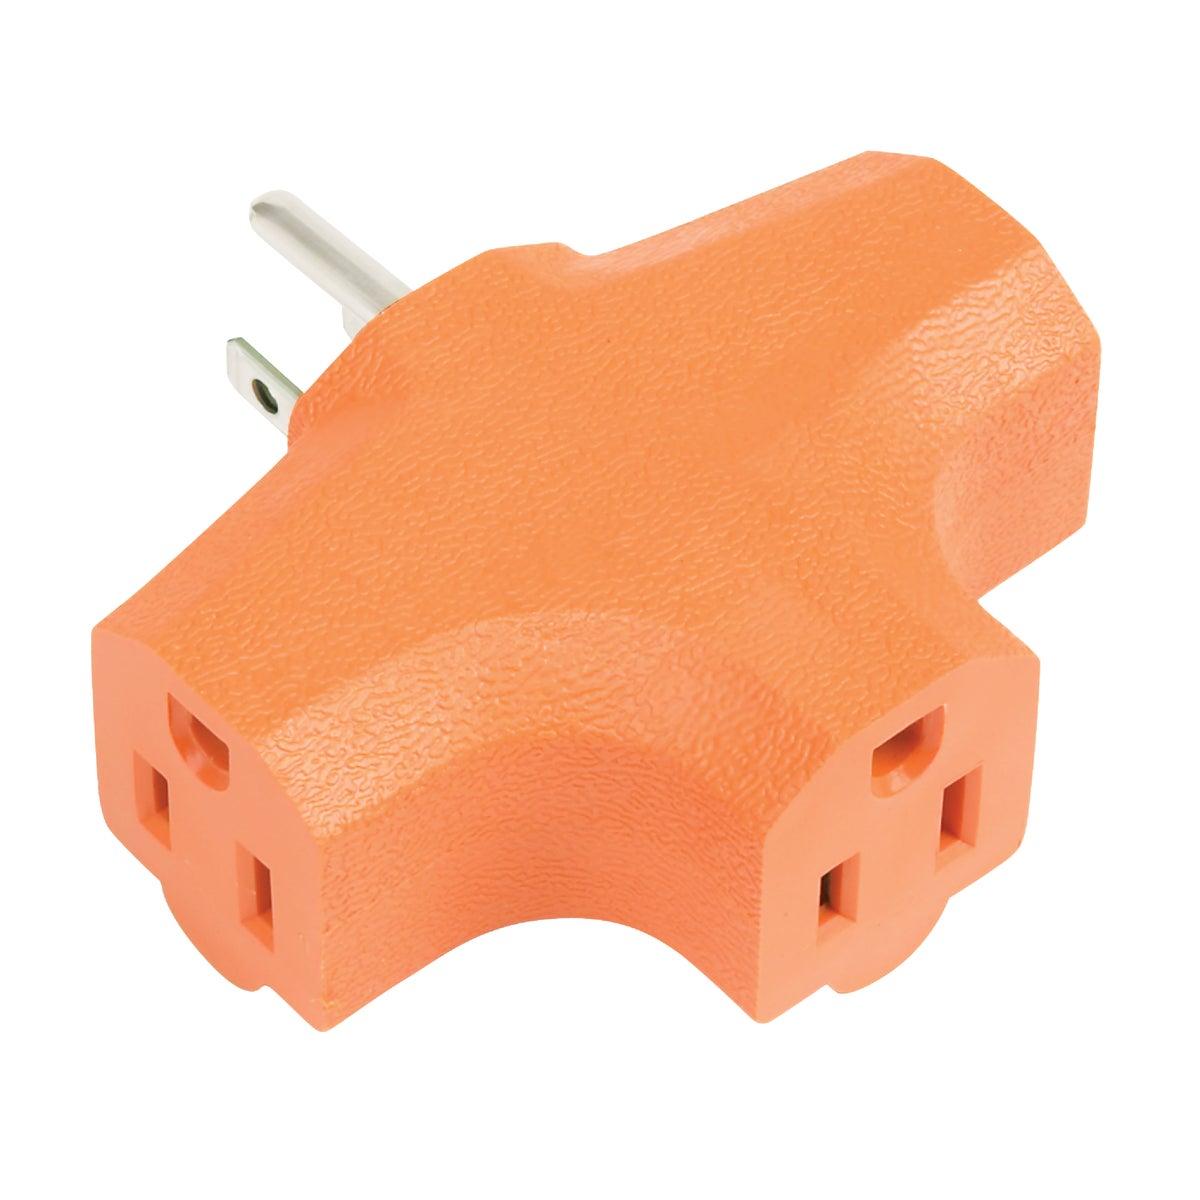 Do it Orange Multi-Outlet Tap, ADAPTER-OR-BK